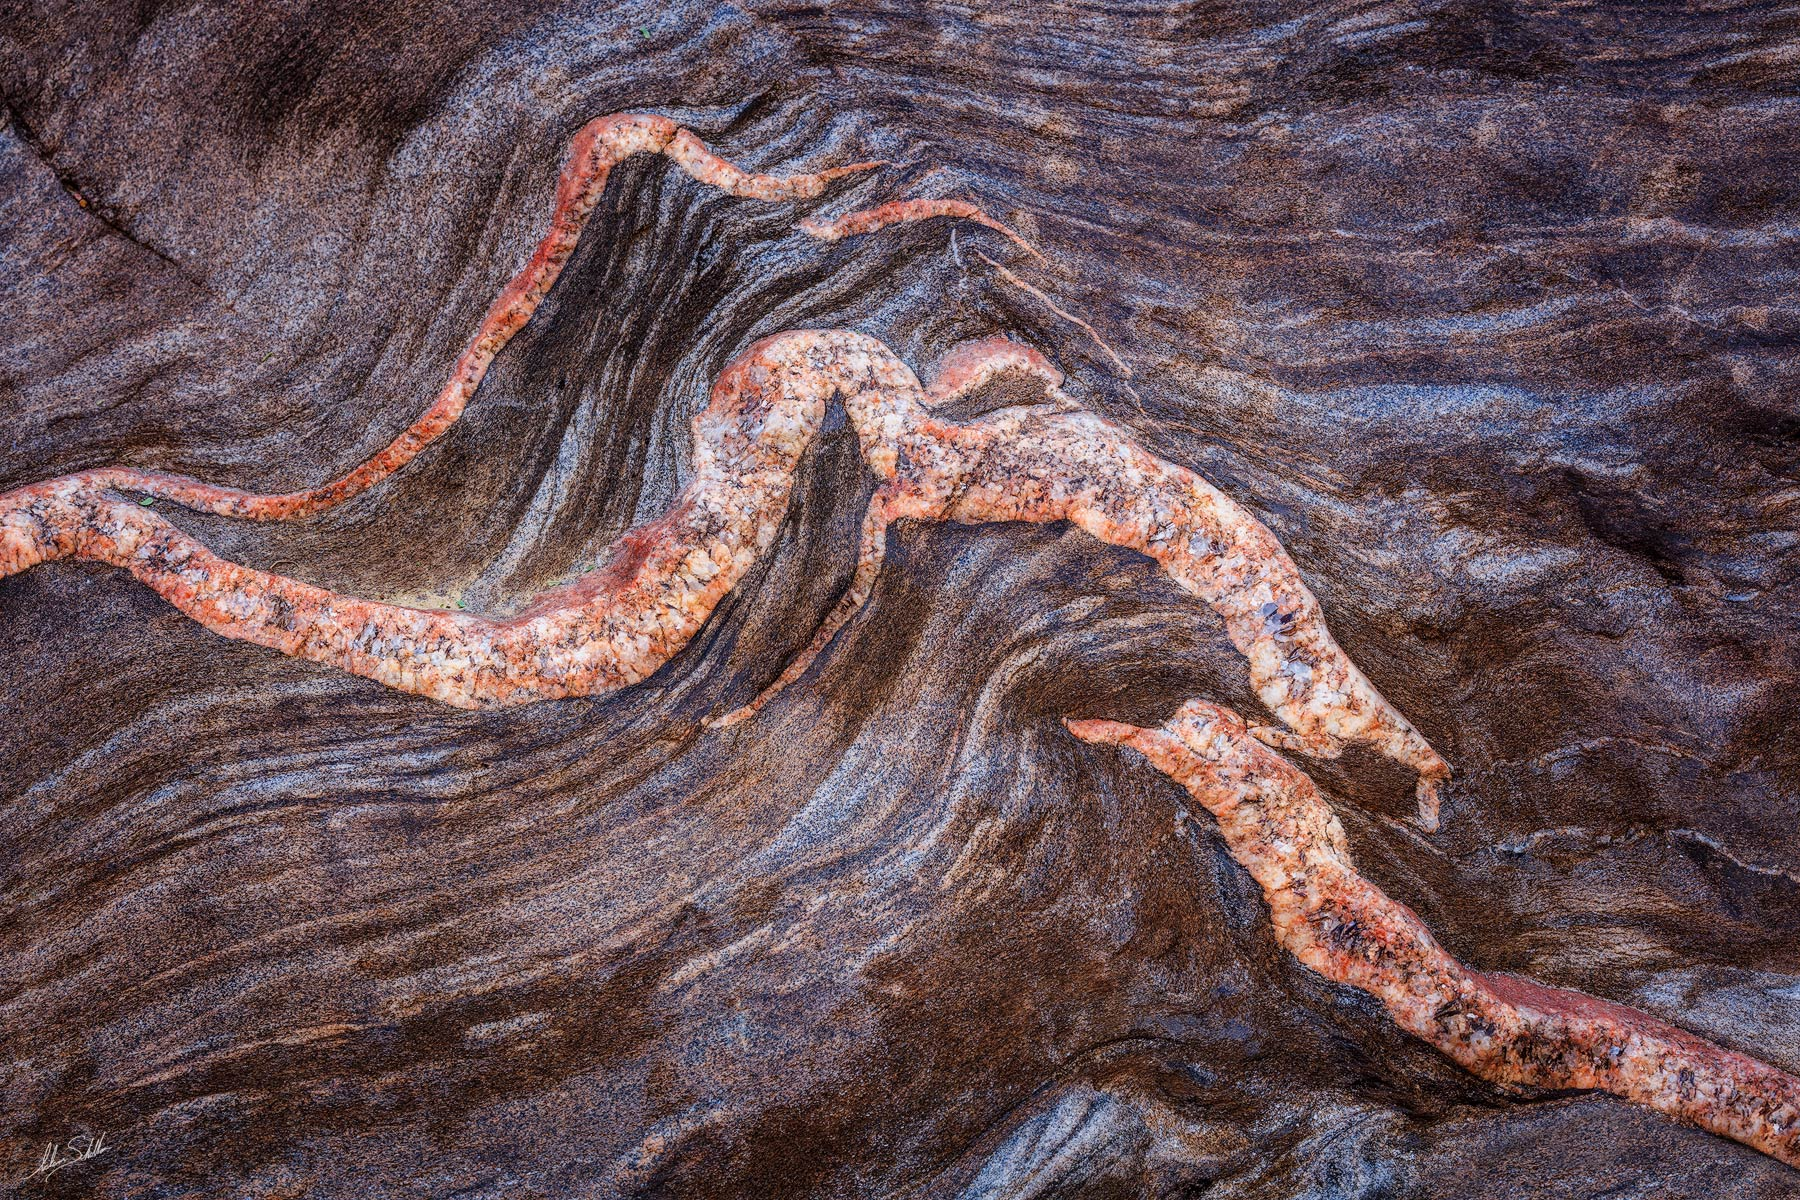 Arizona, Basement Rocks, Below the Rim, Colorado River, Expedition, Grand Canyon, Grand Canyon National Park, Granite Gorge, National Park, Pink Zoroaster Granite, River Trip, Vishnu Basement Rock, photo